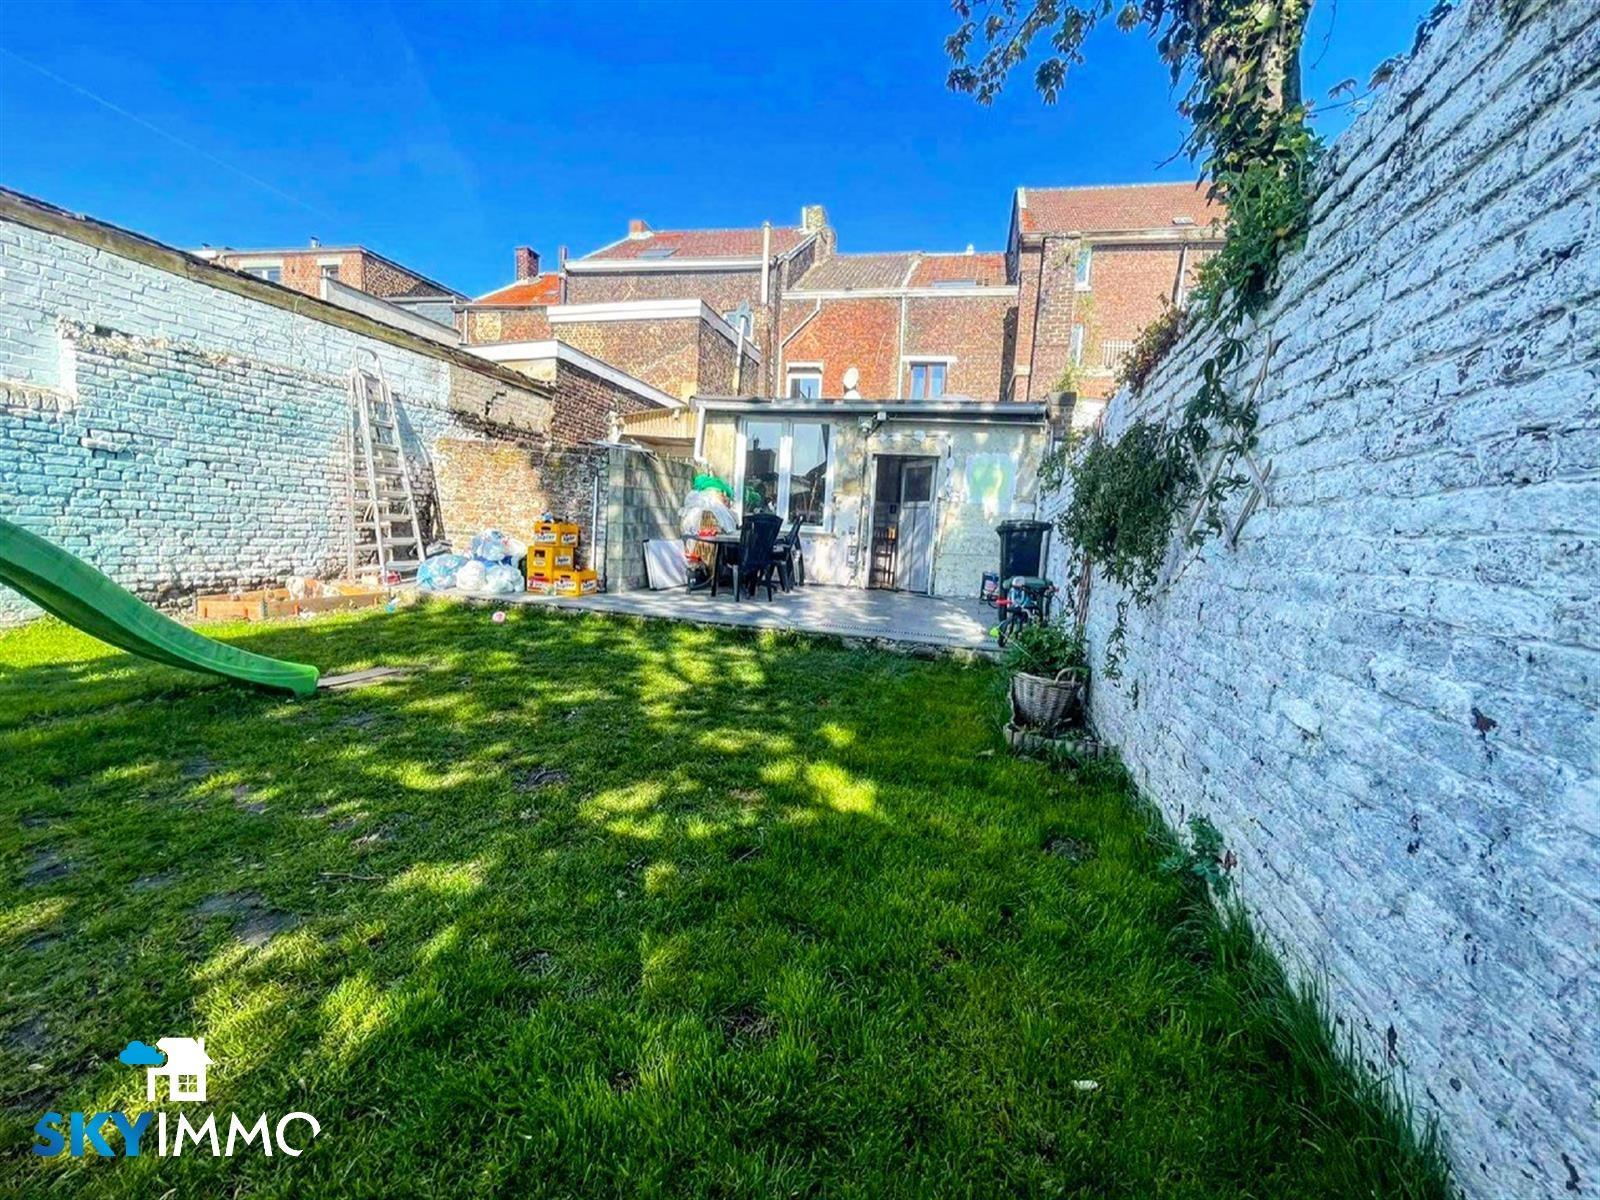 Maison - Seraing Jemeppesur-Meuse - #4343977-11